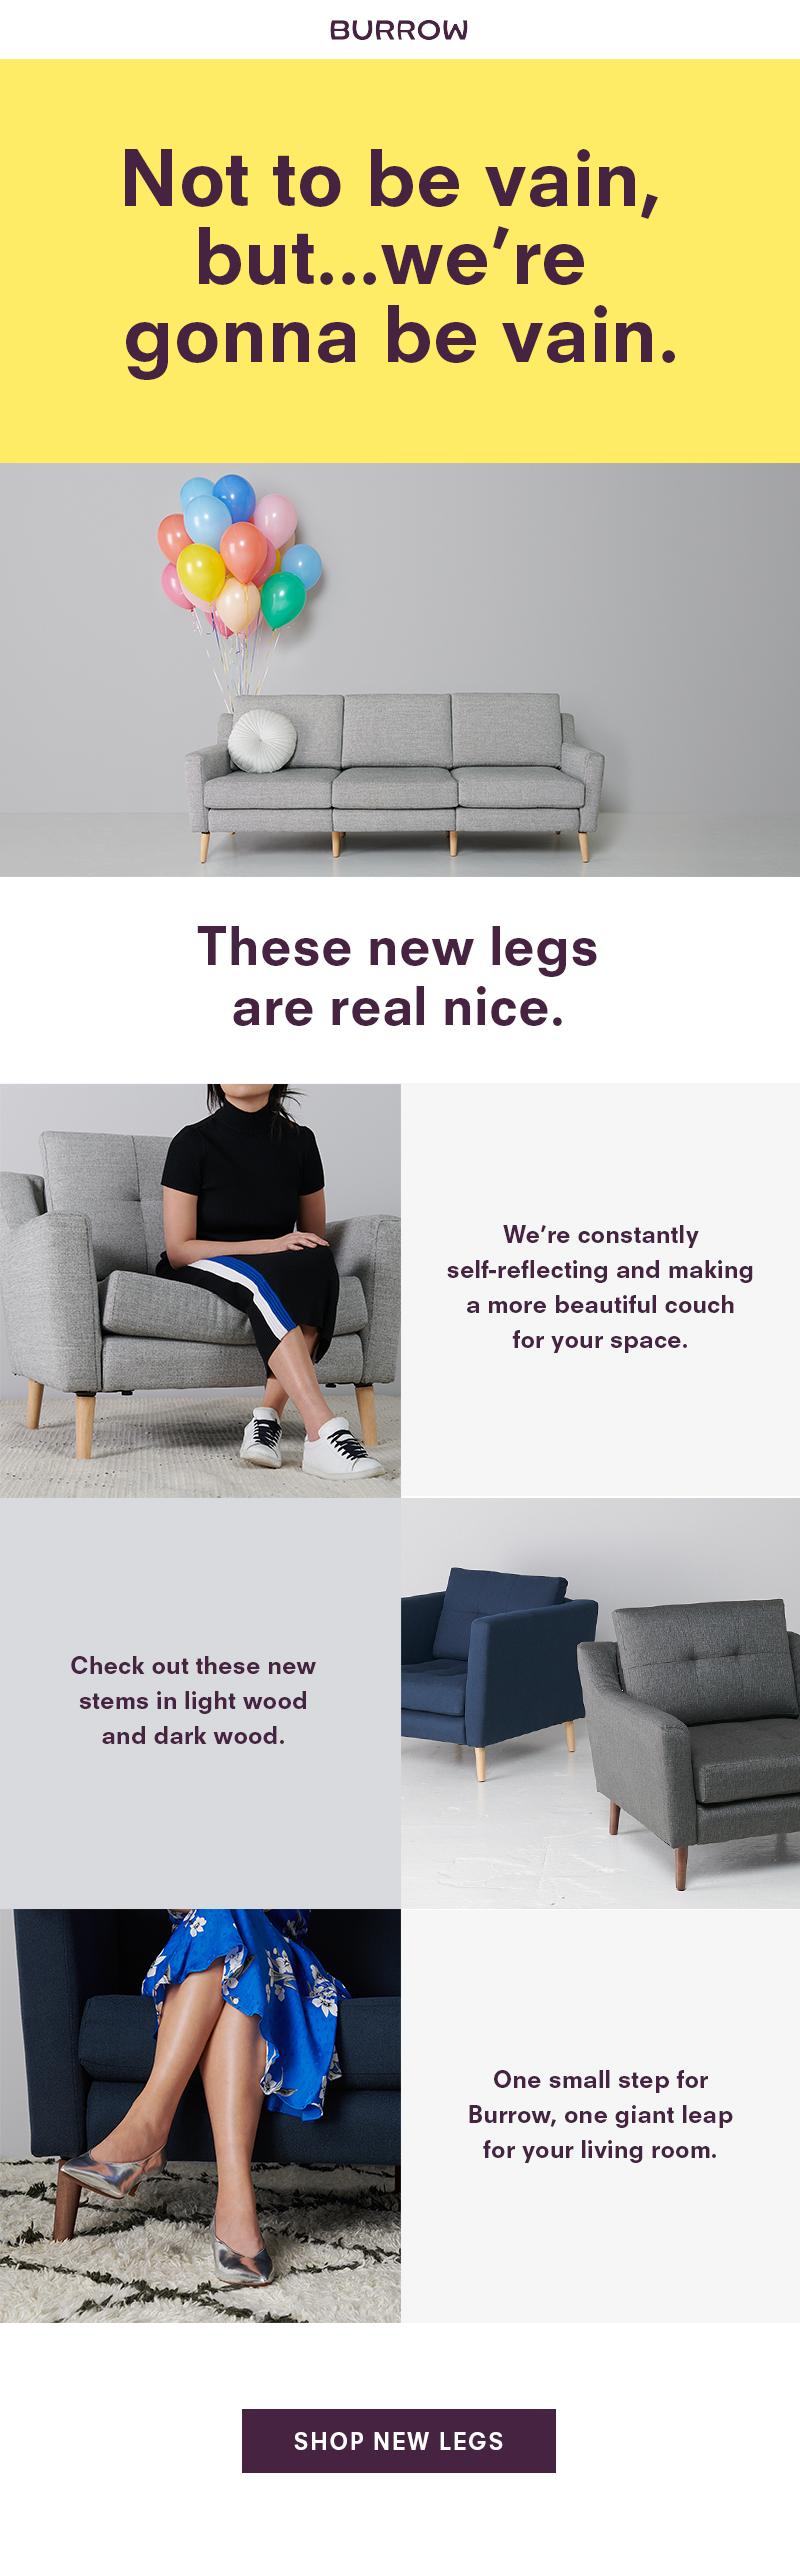 20180306_Burrow-Legs-Email_f.jpg